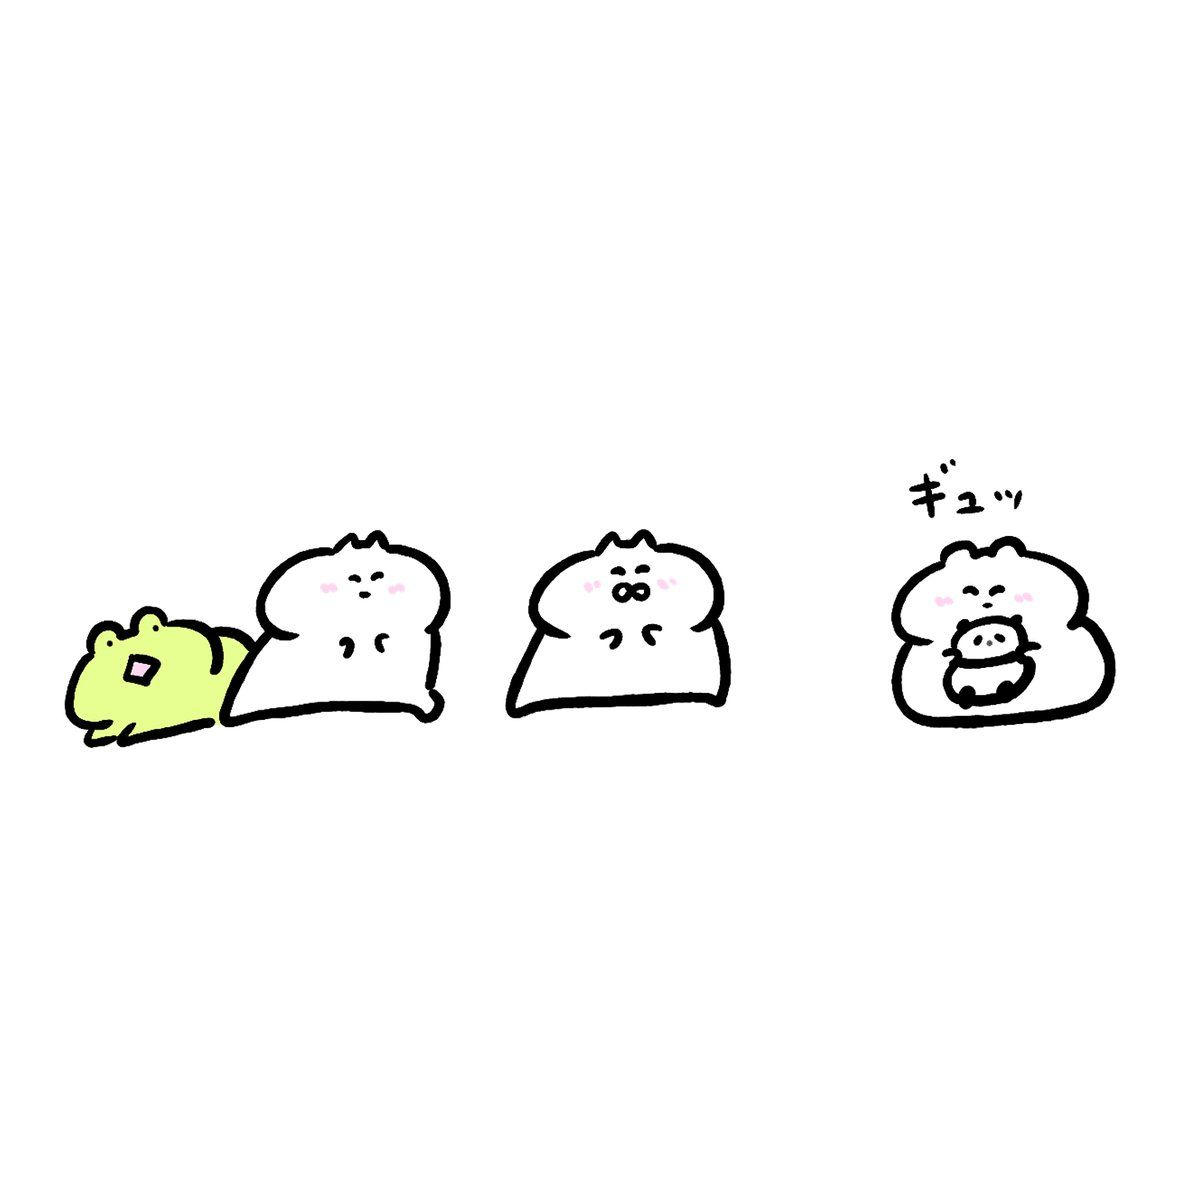 (23) Twitter